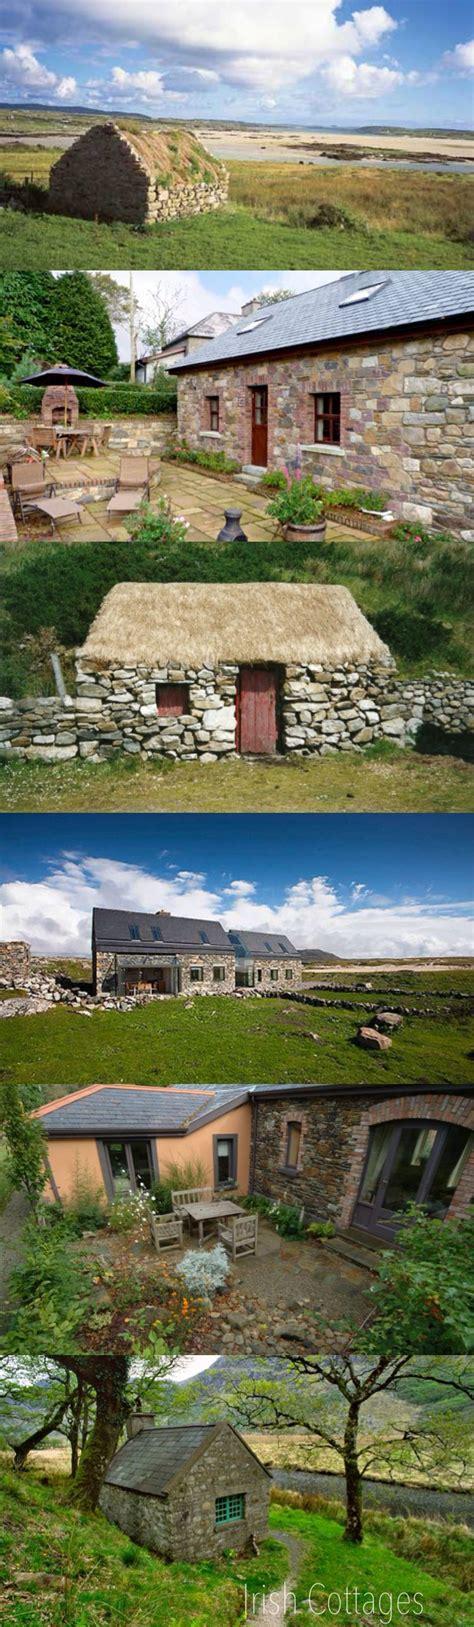 cottage in irlanda cottages cottages irlanda